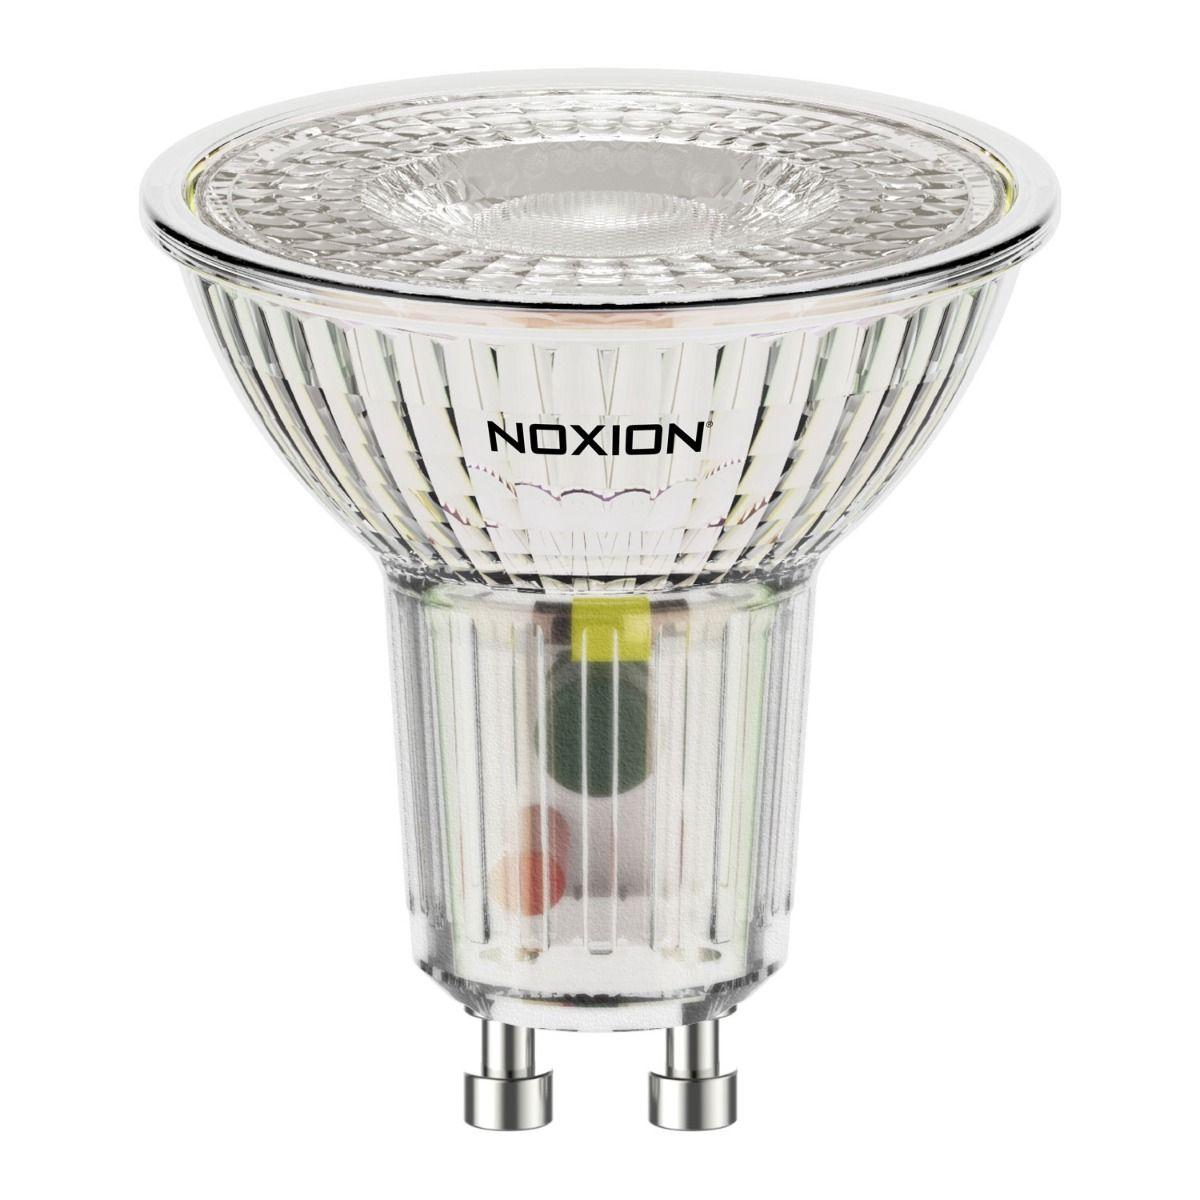 Noxion LED Spot GU10 4W 830 36D 390lm | Replacer for 50W